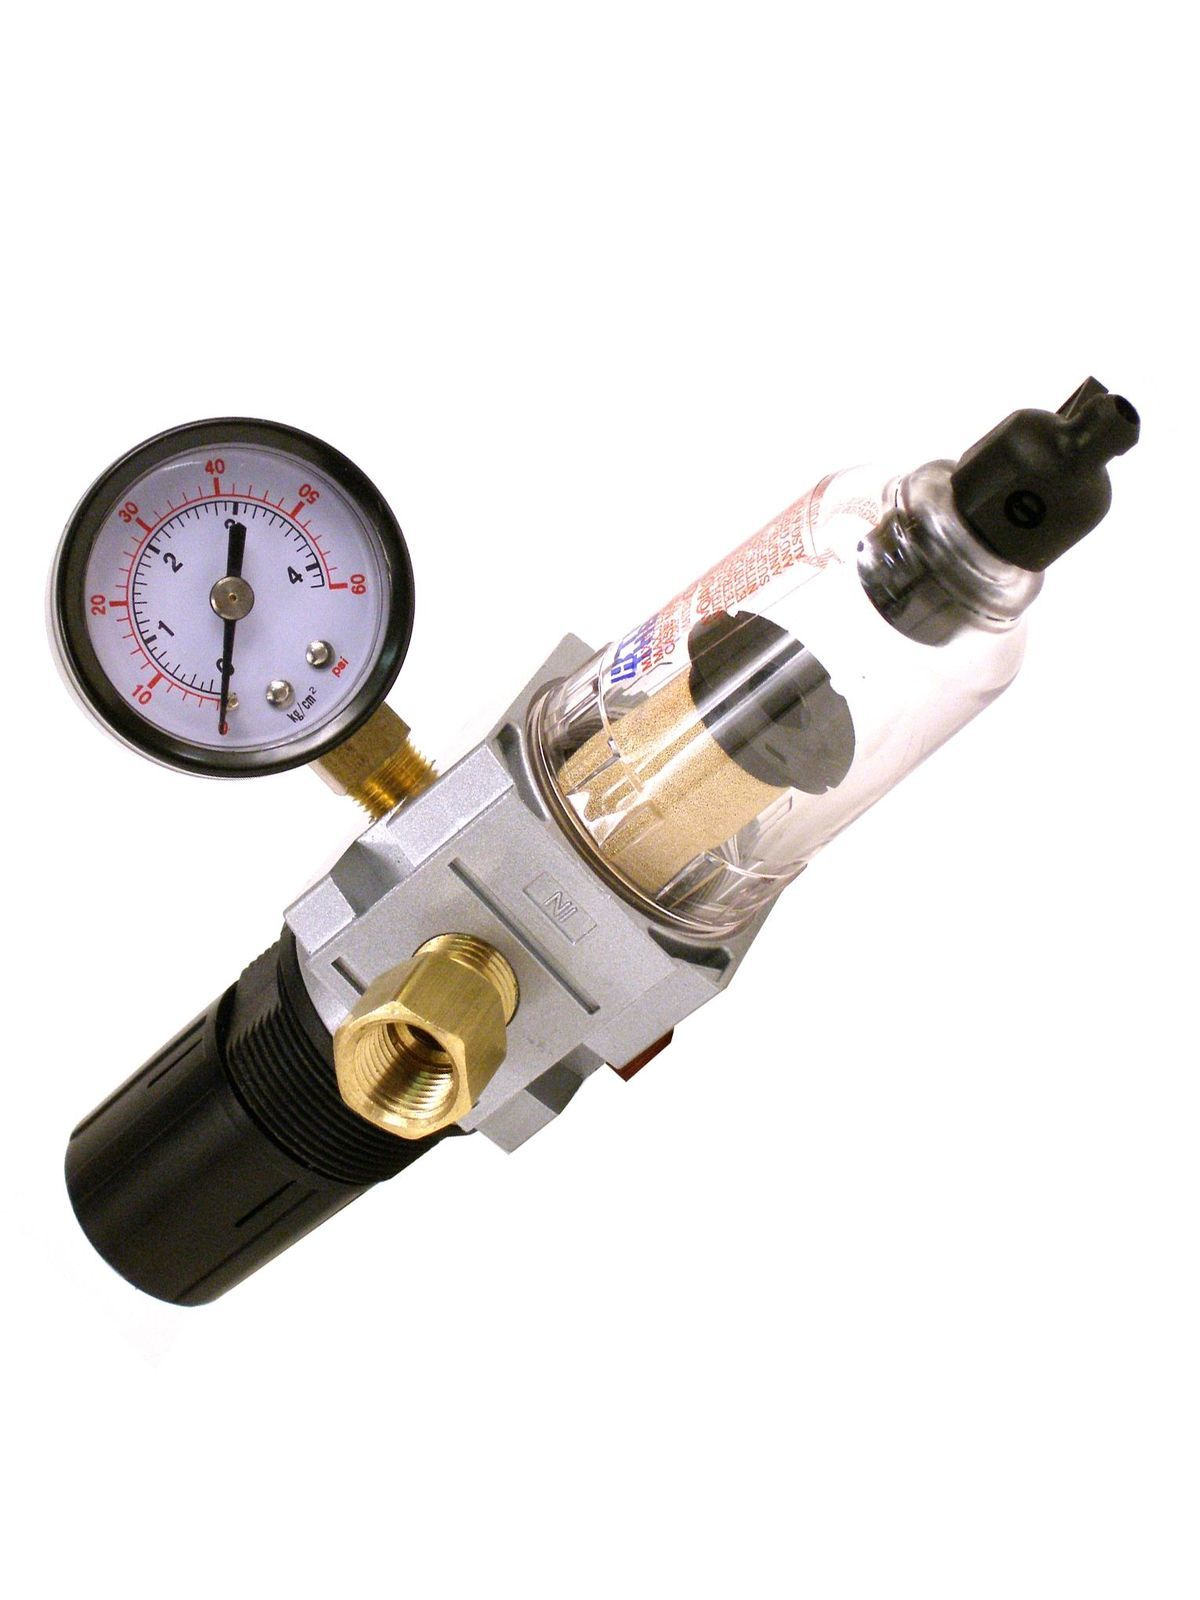 Badger Air Regulator, Filter and Gauge for Air Compressors